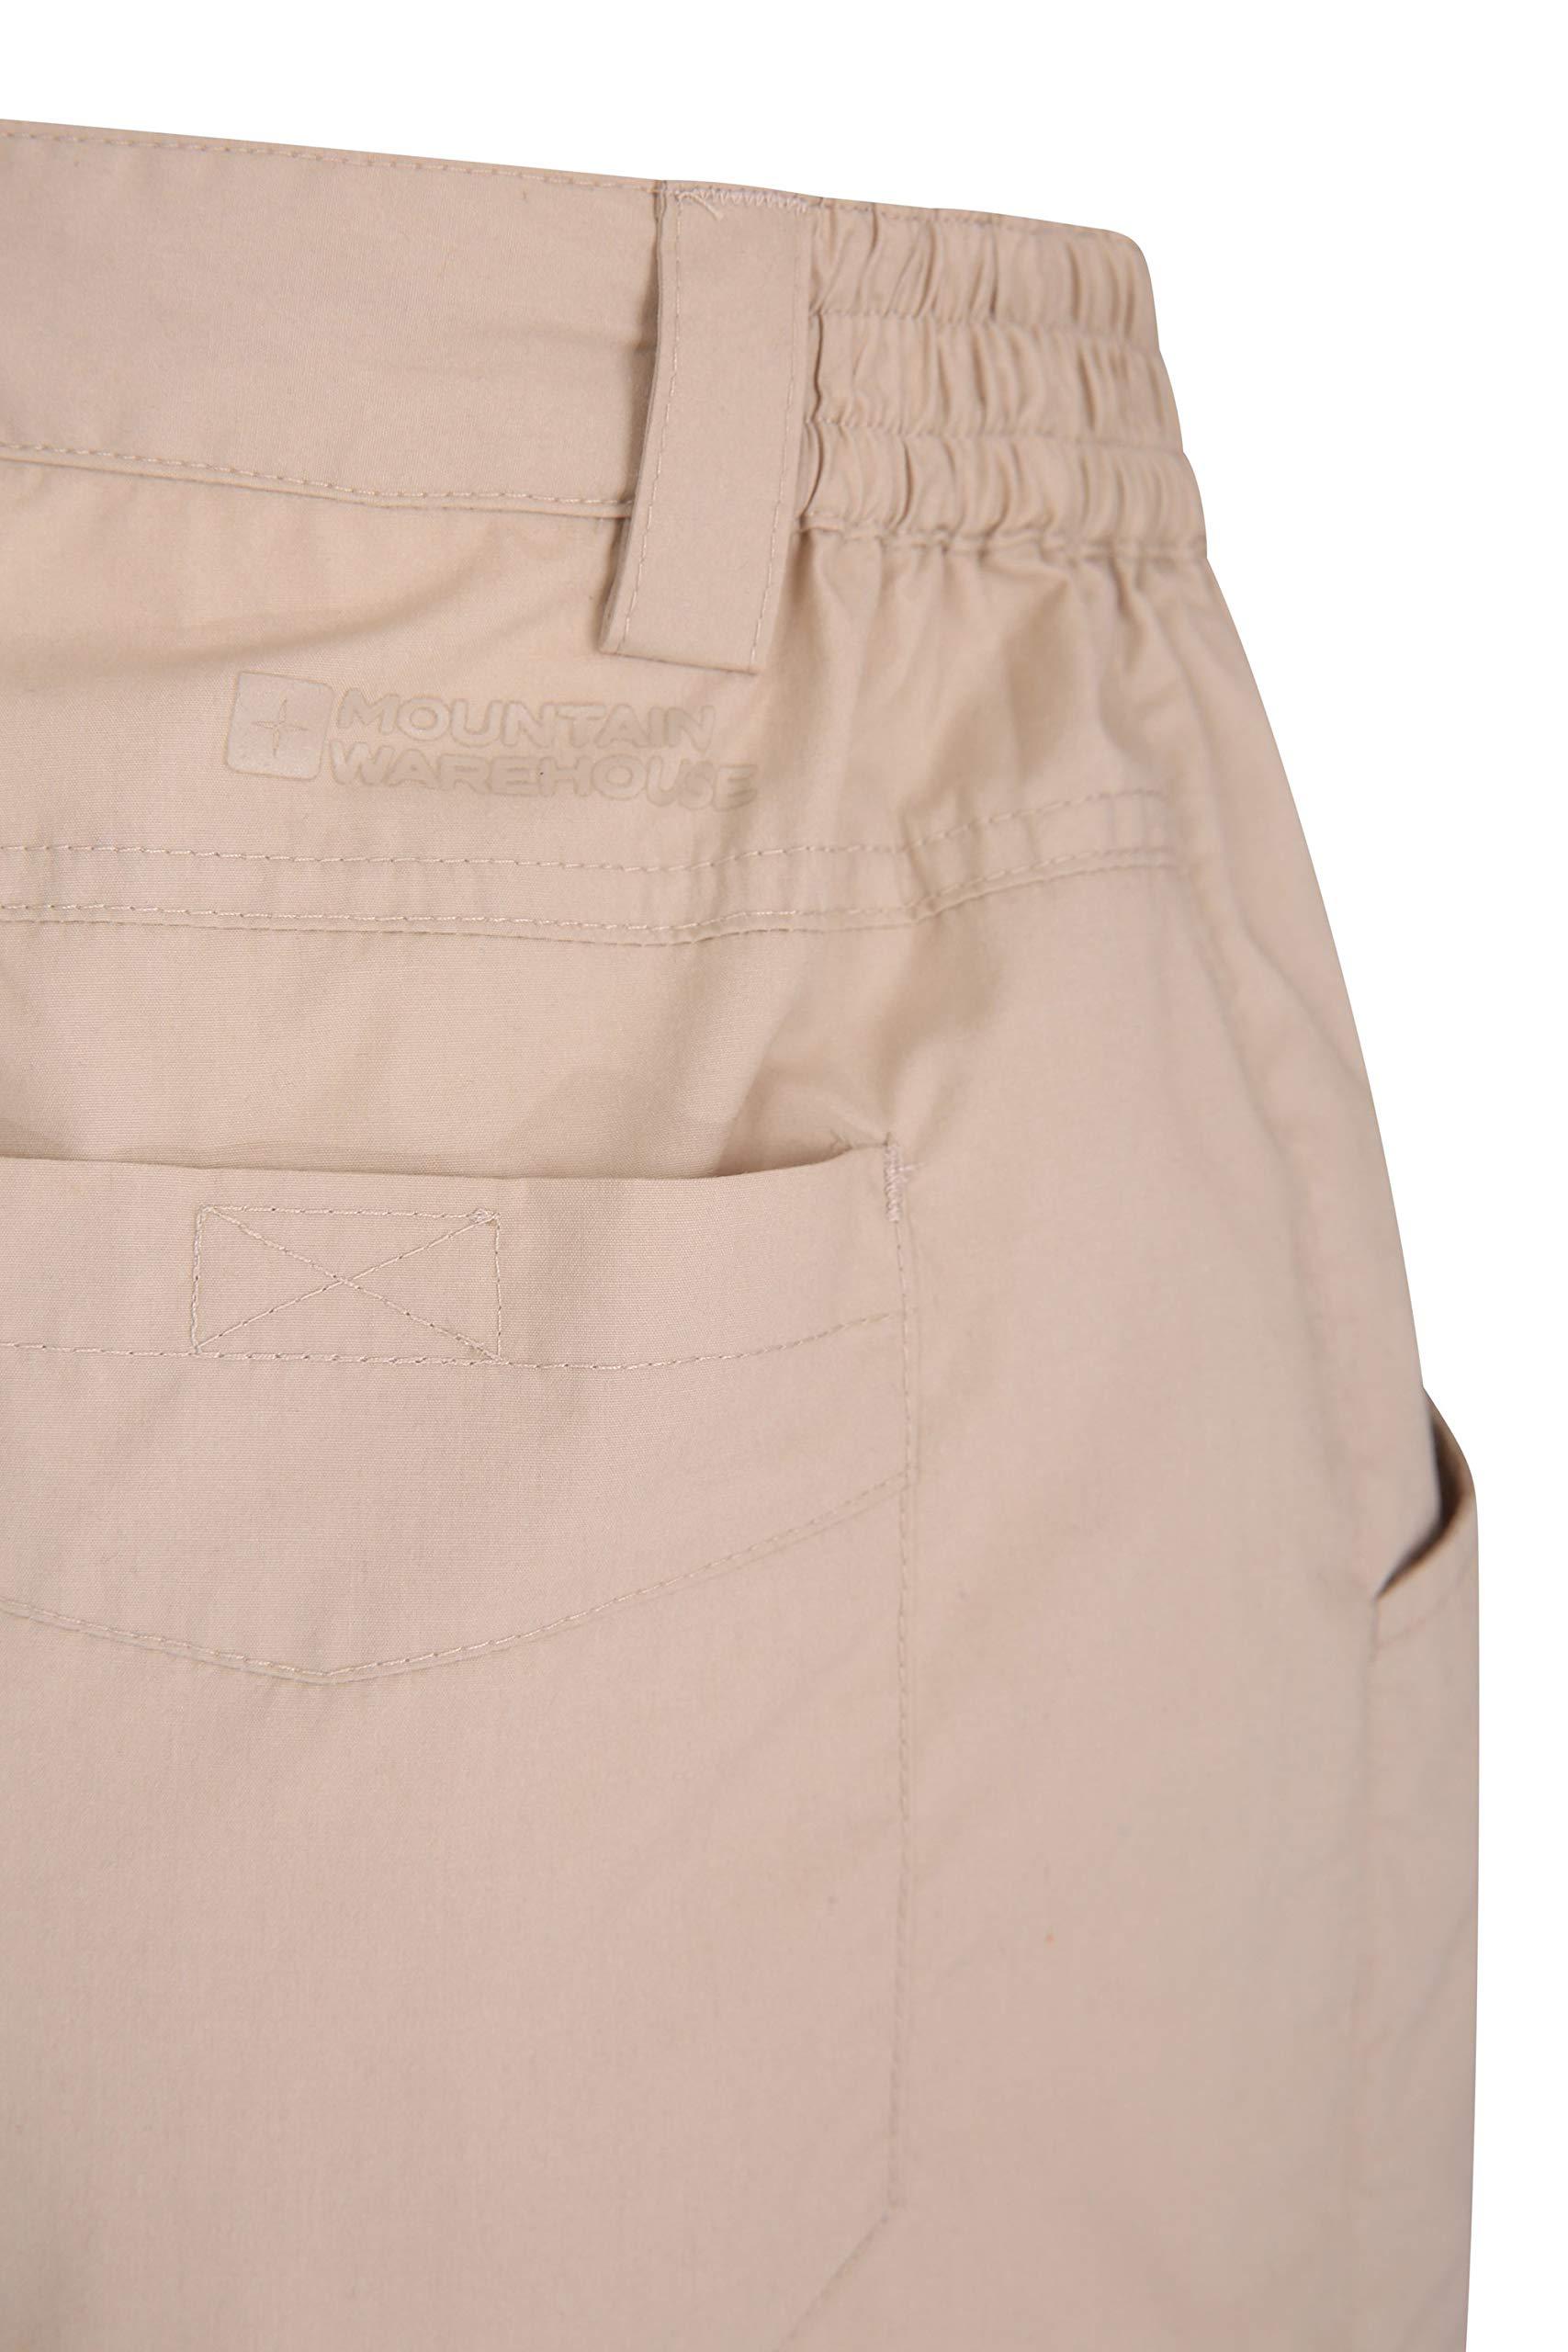 Mountain Warehouse Quest Womens Shorts – 100% Cotton Pants, Lightweight Ladies Short Trousers, Multiple Pockets – Best…